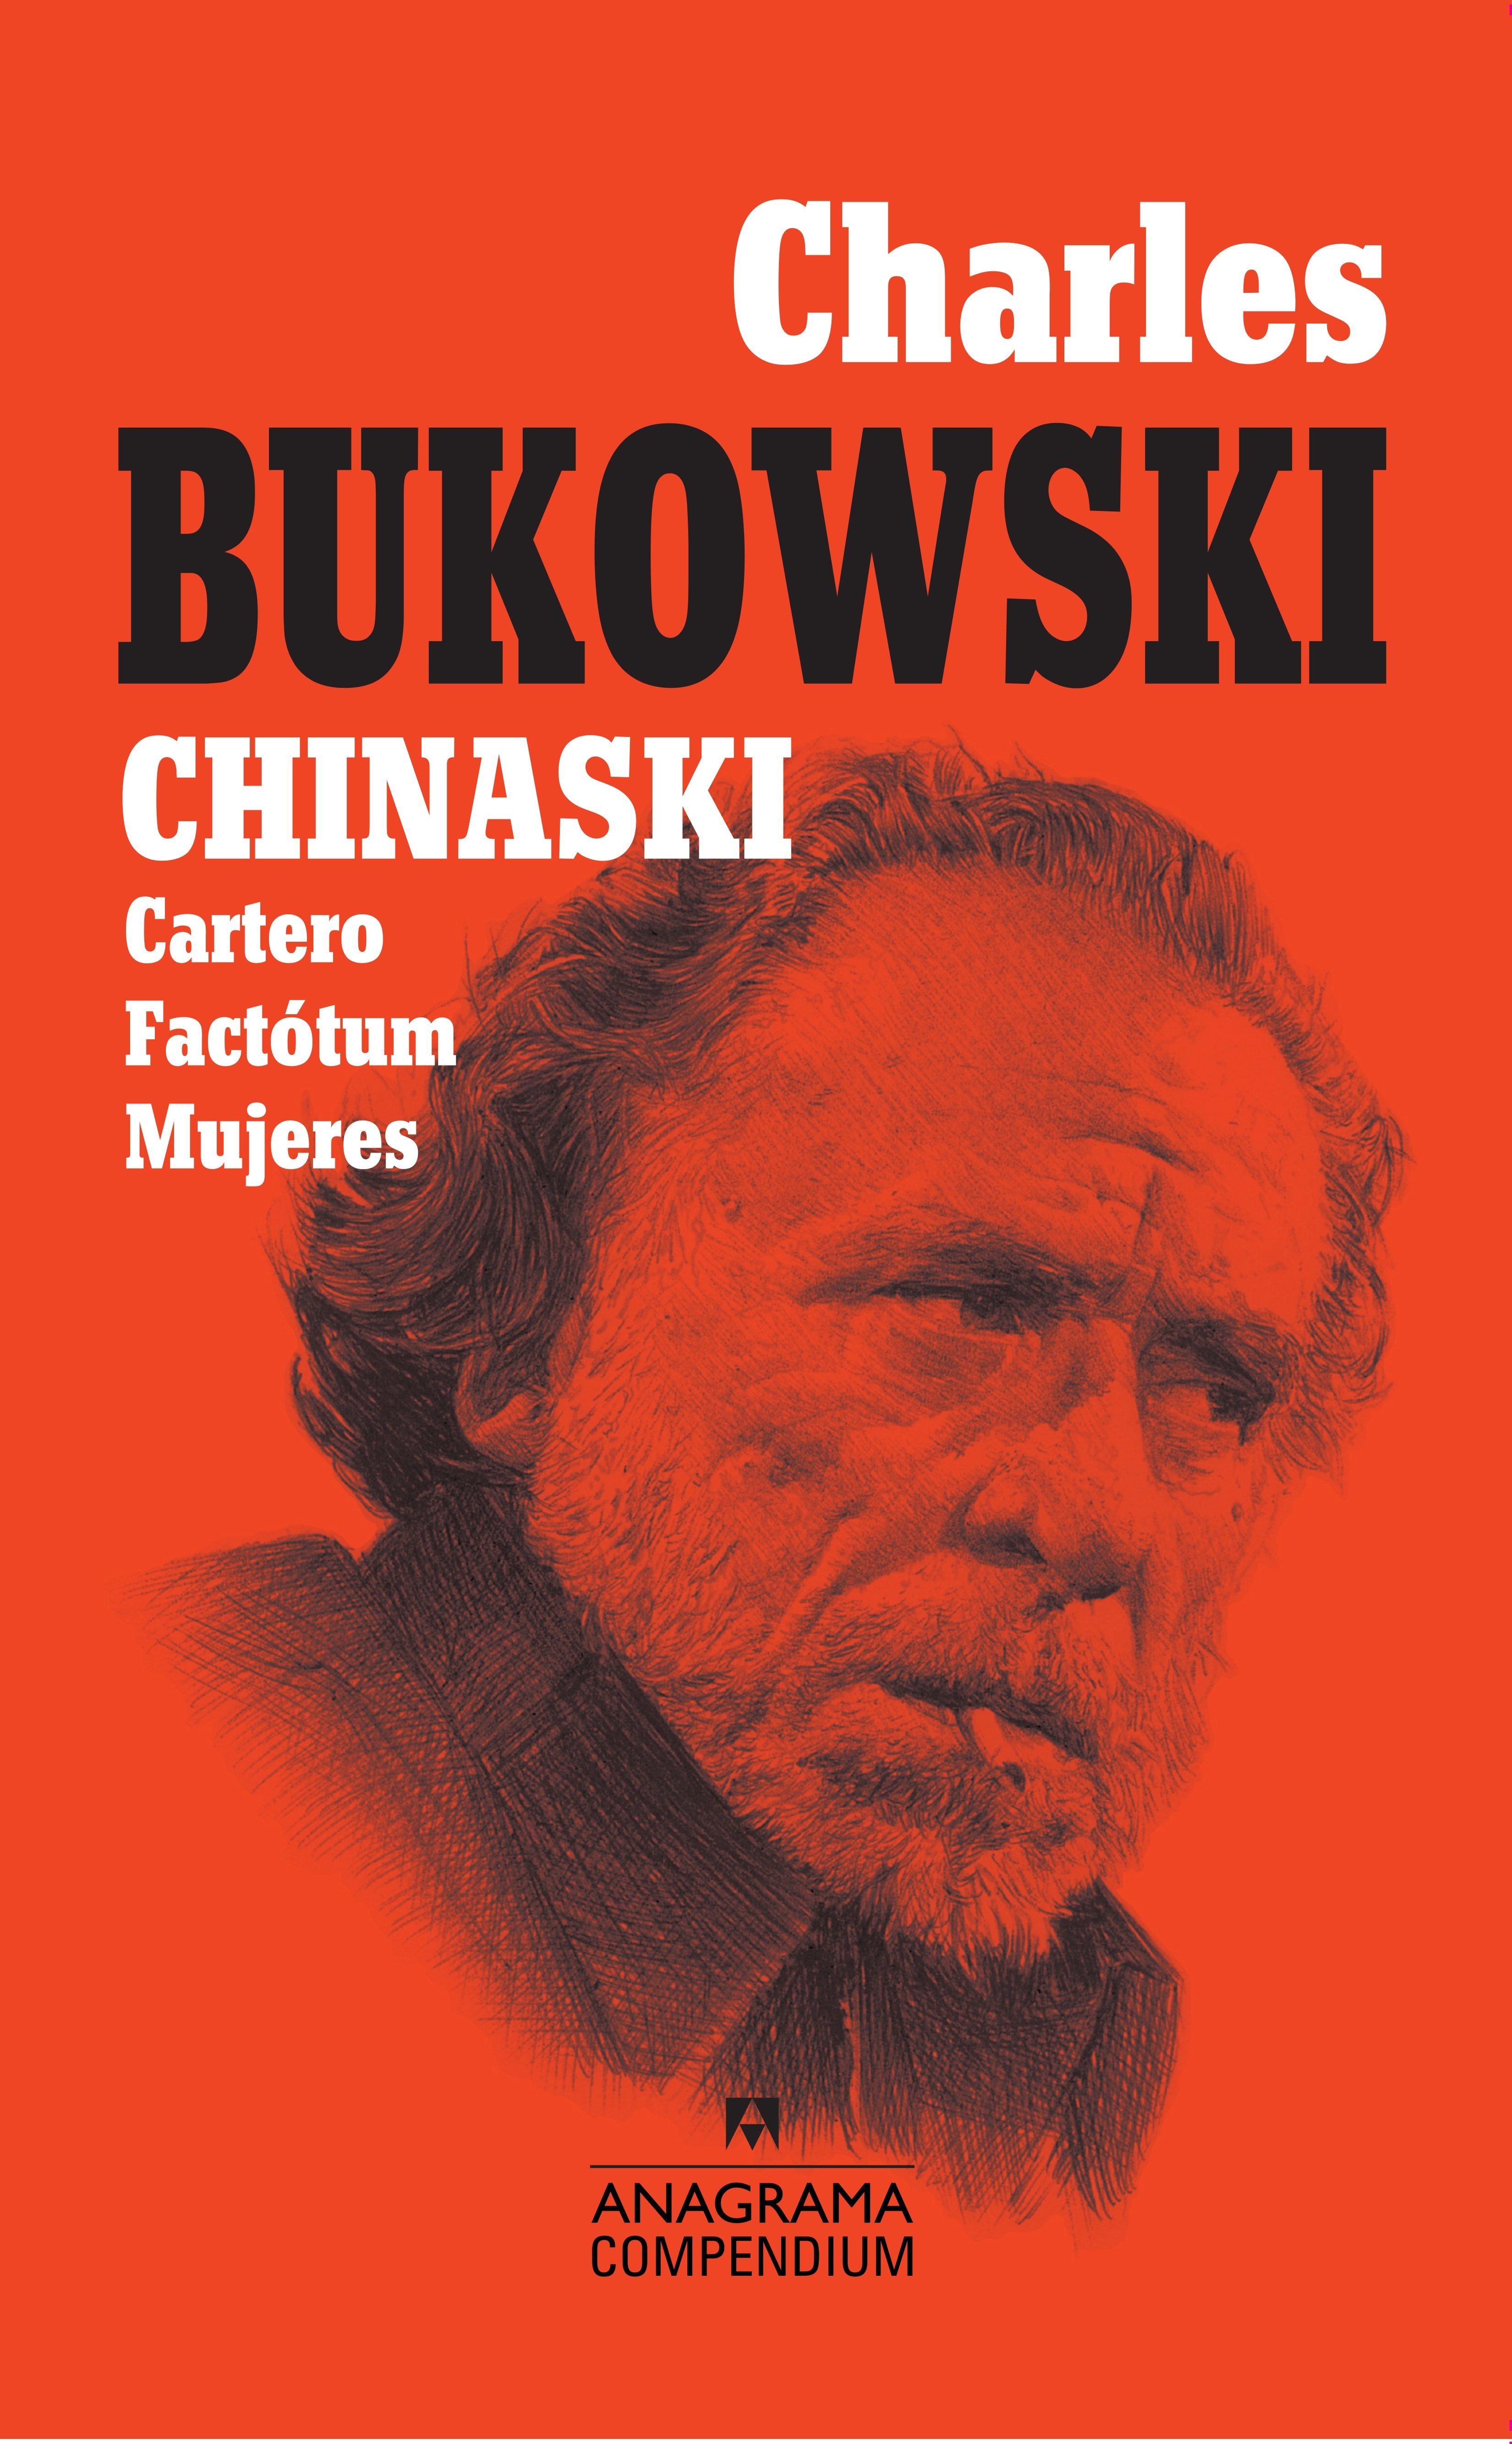 Chinaski Cartero Factotum Mujeres - Charles Bukowski - Anagrama